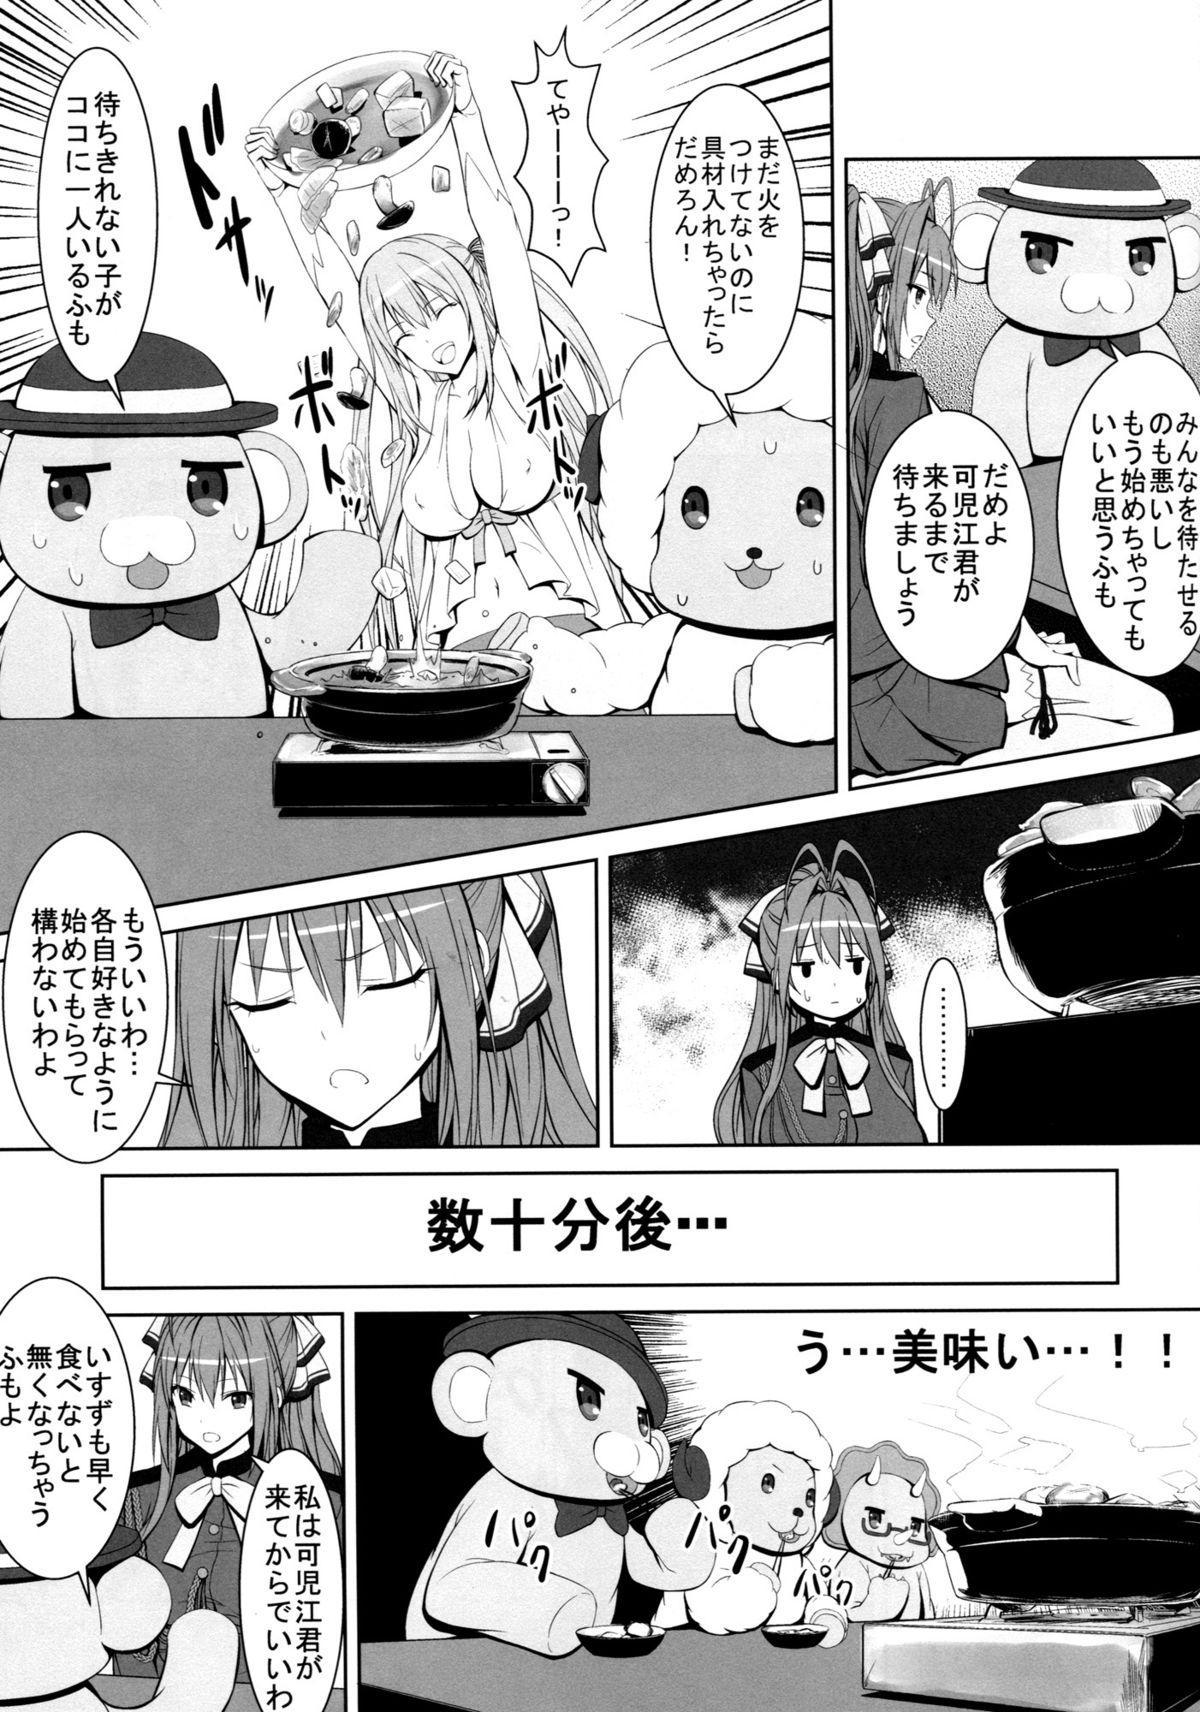 Maple Kinoko wa Abunai Kinoko? 3